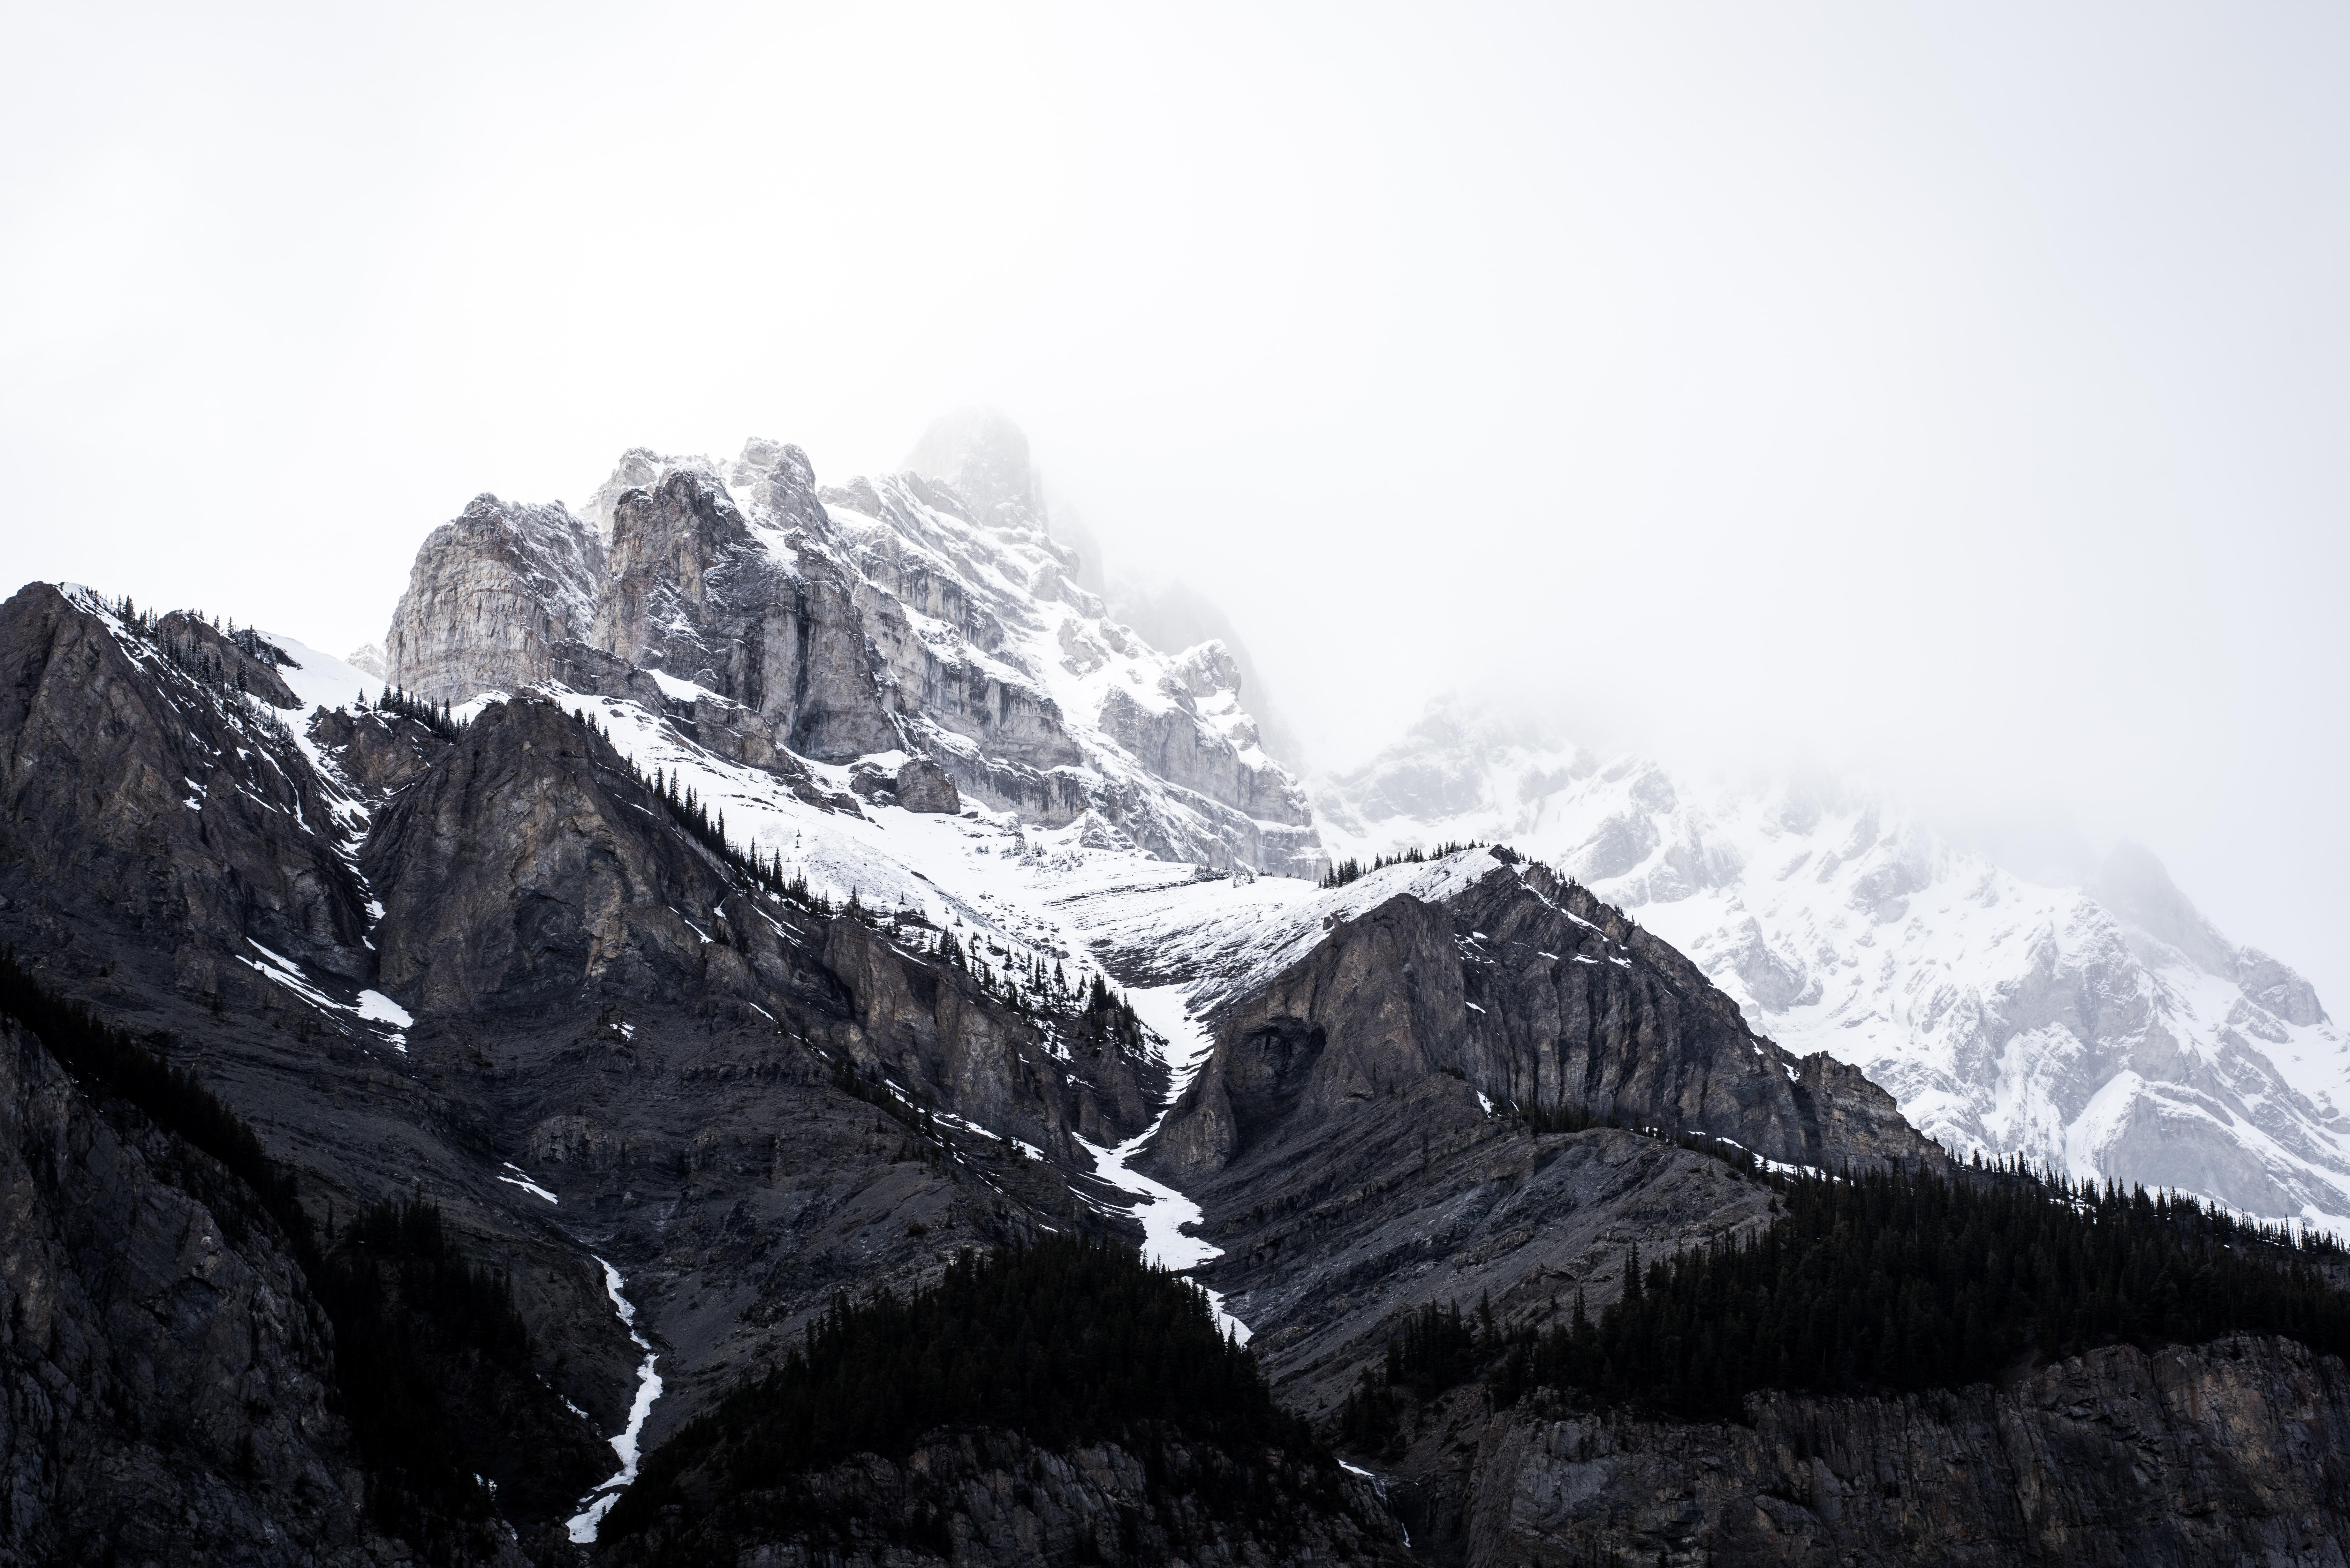 Fog masks the snow capped peaks of Banff